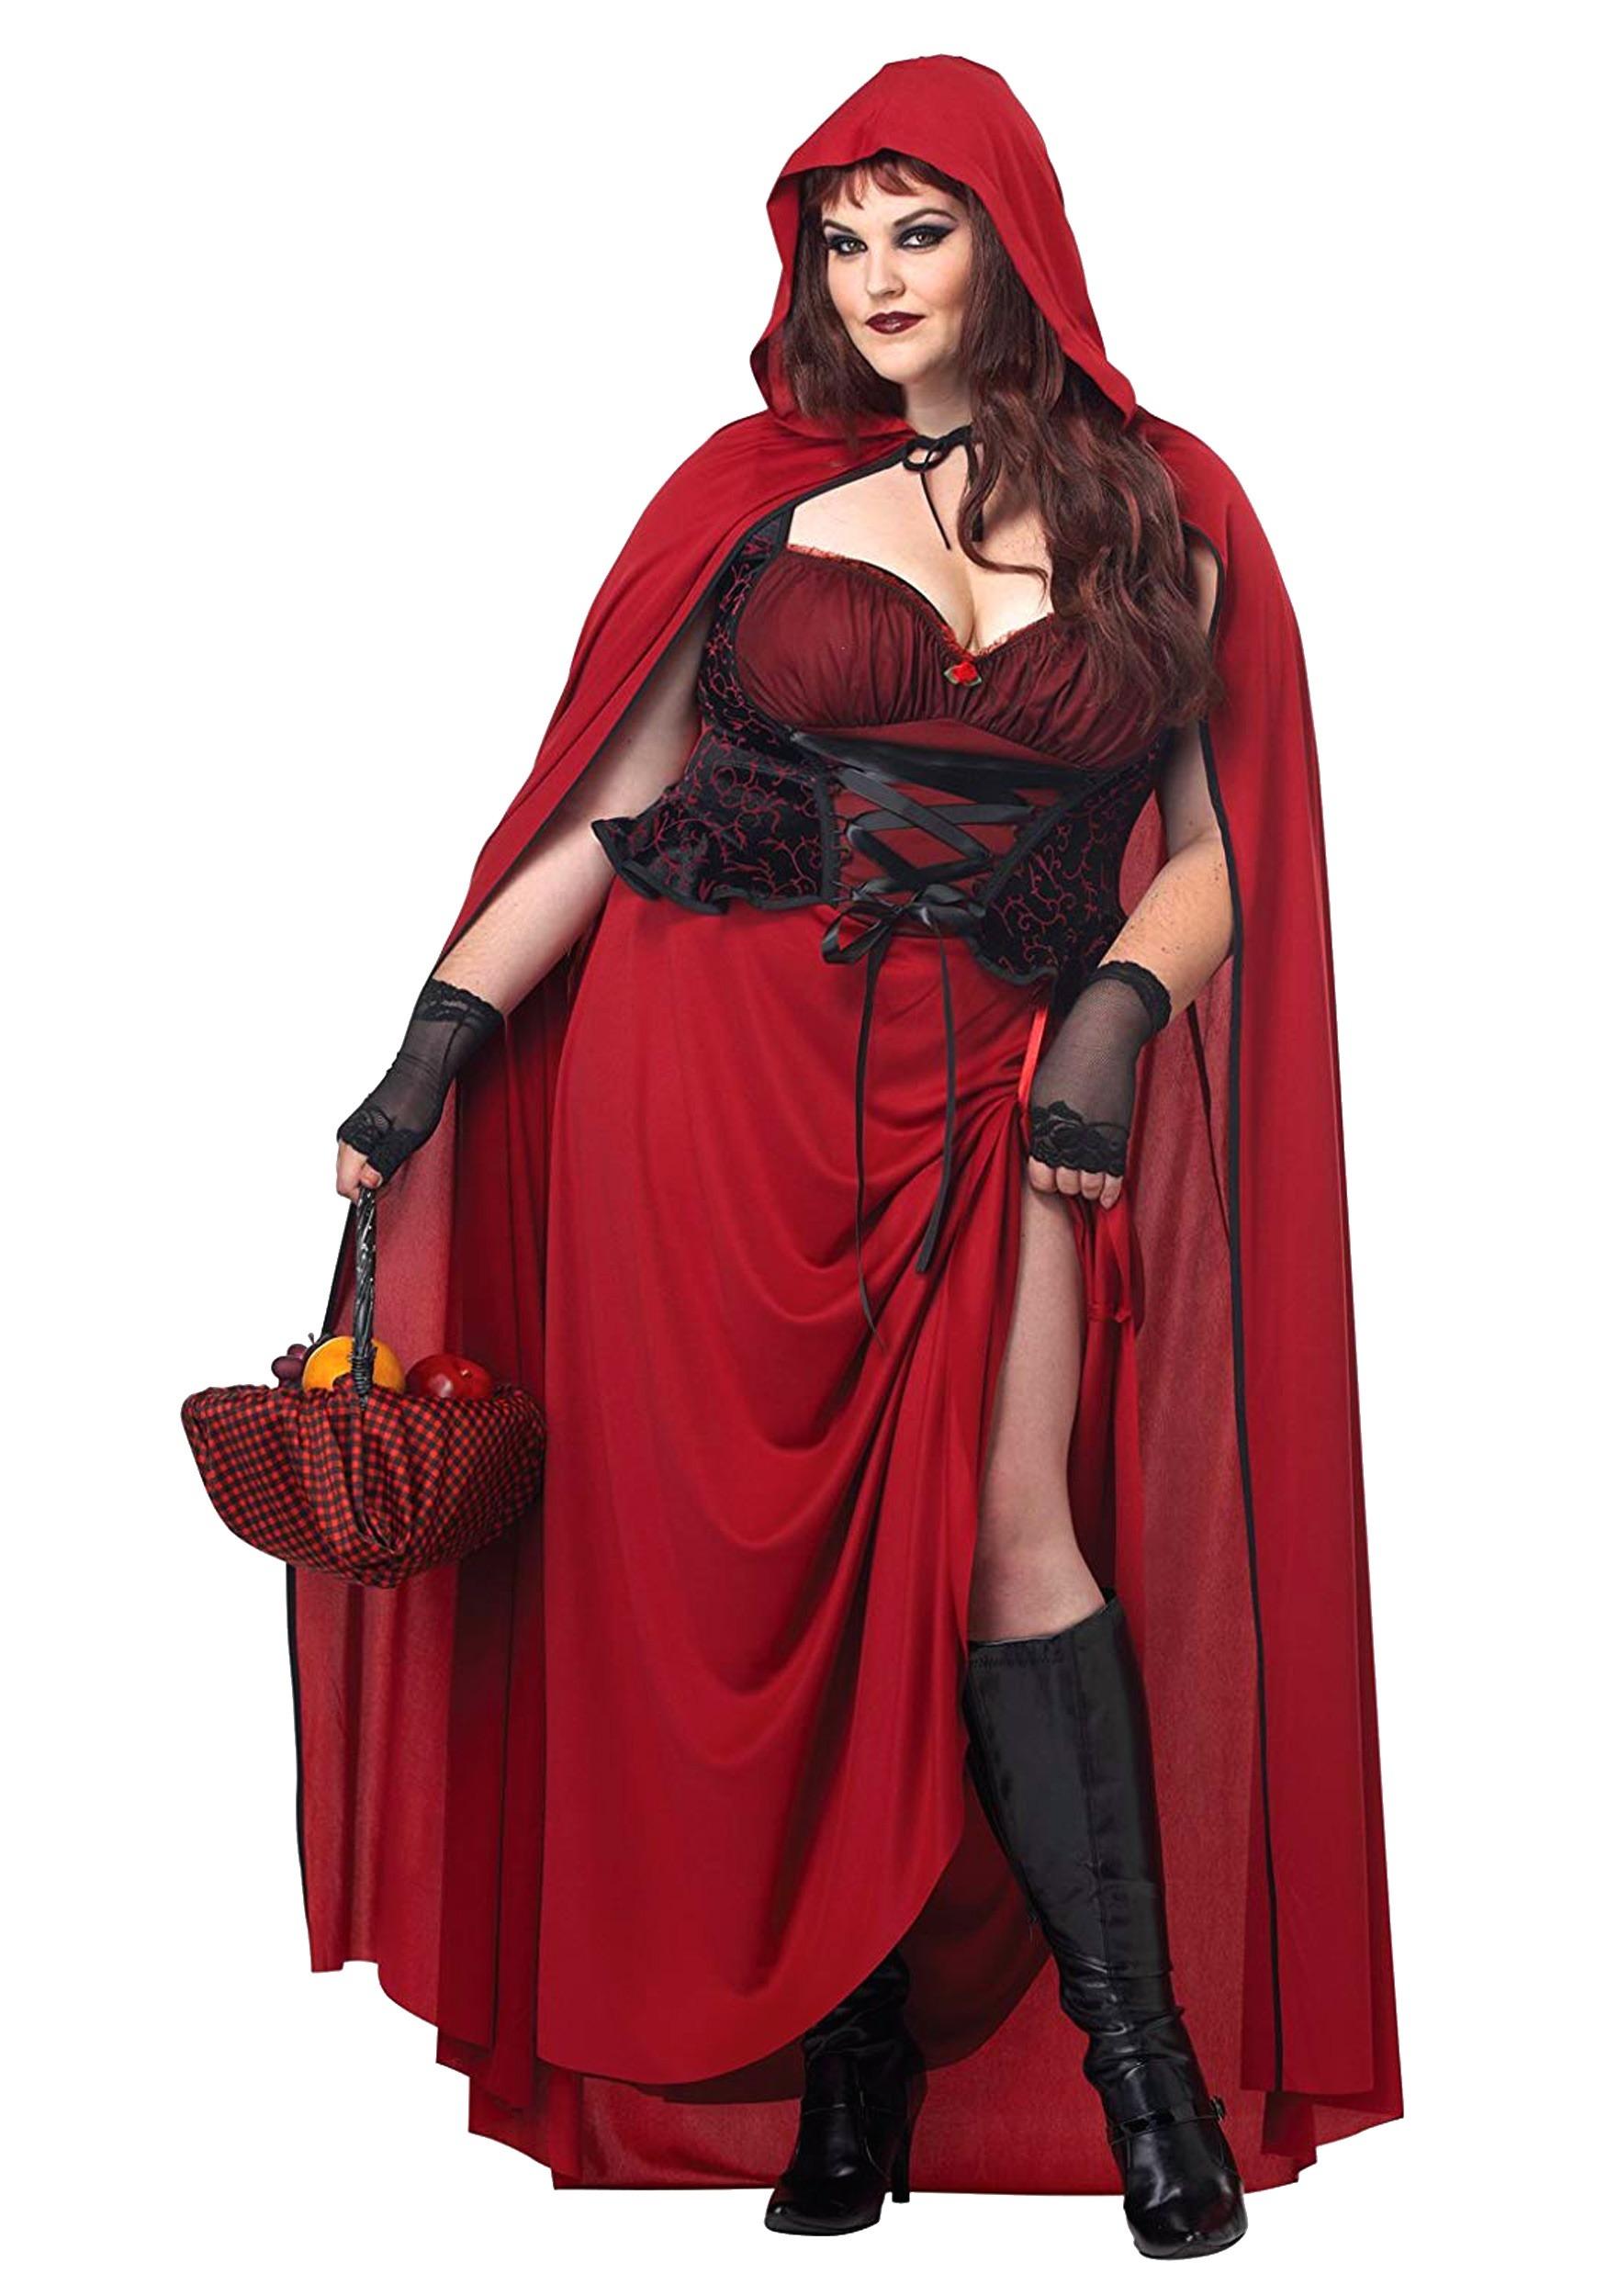 Dark Red Riding Hood Plus Size Women s Costume Update1 821856a091